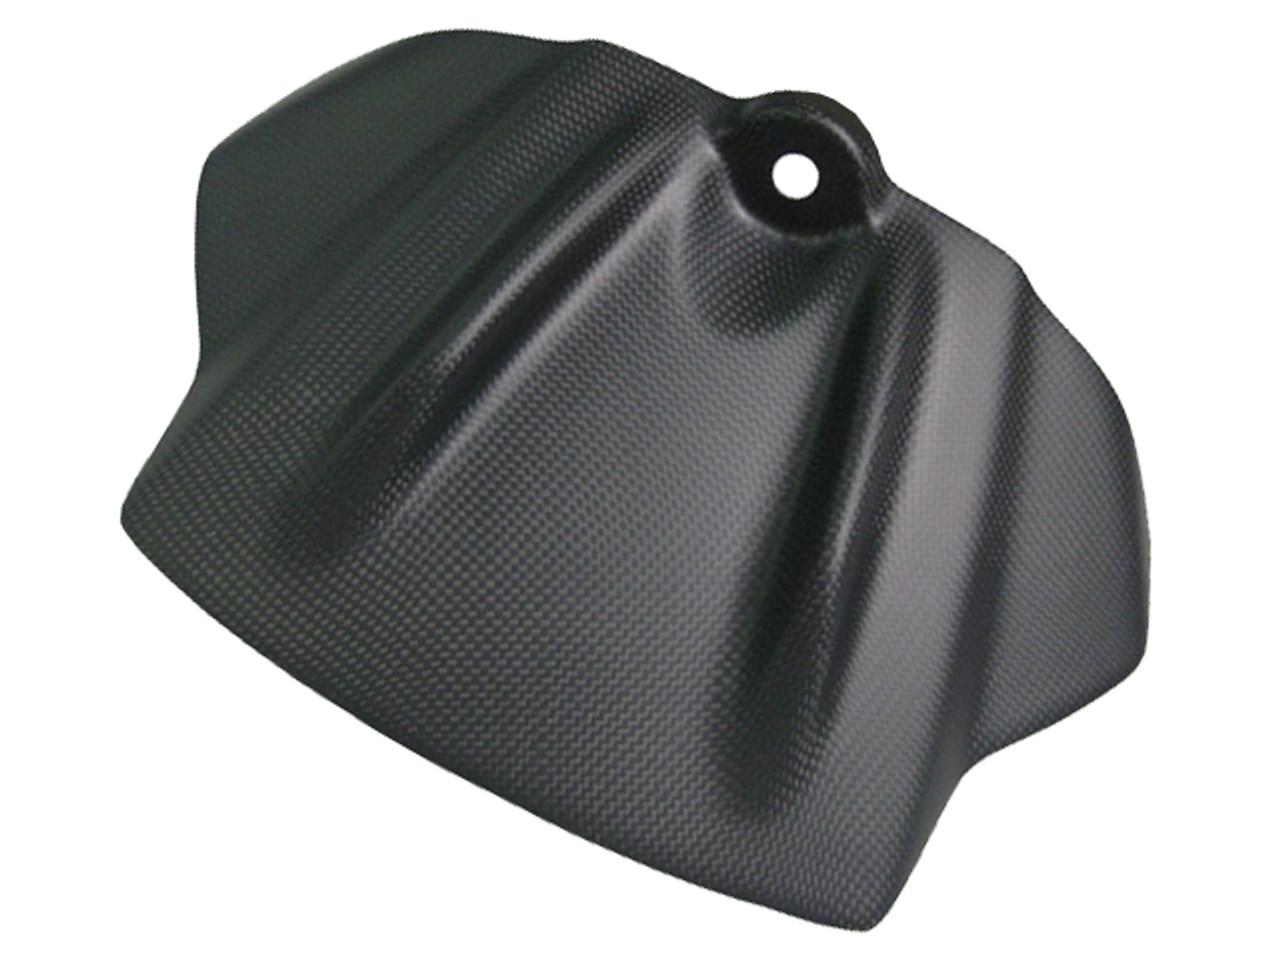 Matte Plain Weave Carbon Fiber Tank Front Cover for Aprilia RSV4 09-12, Tuono V4 11-13